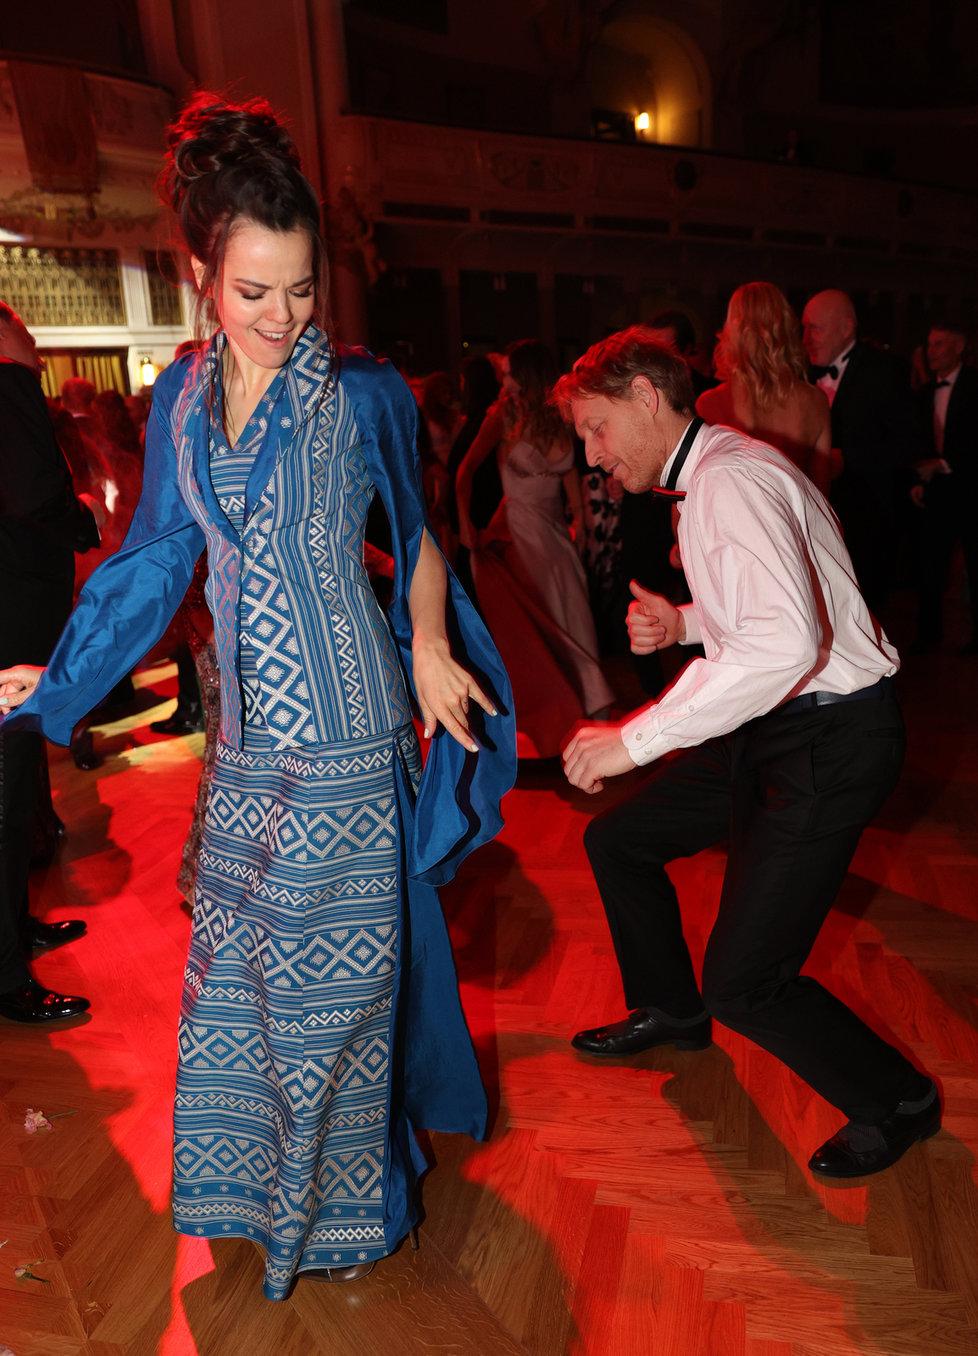 Nejdivočejší tanec - Lilia a Karel Janeček